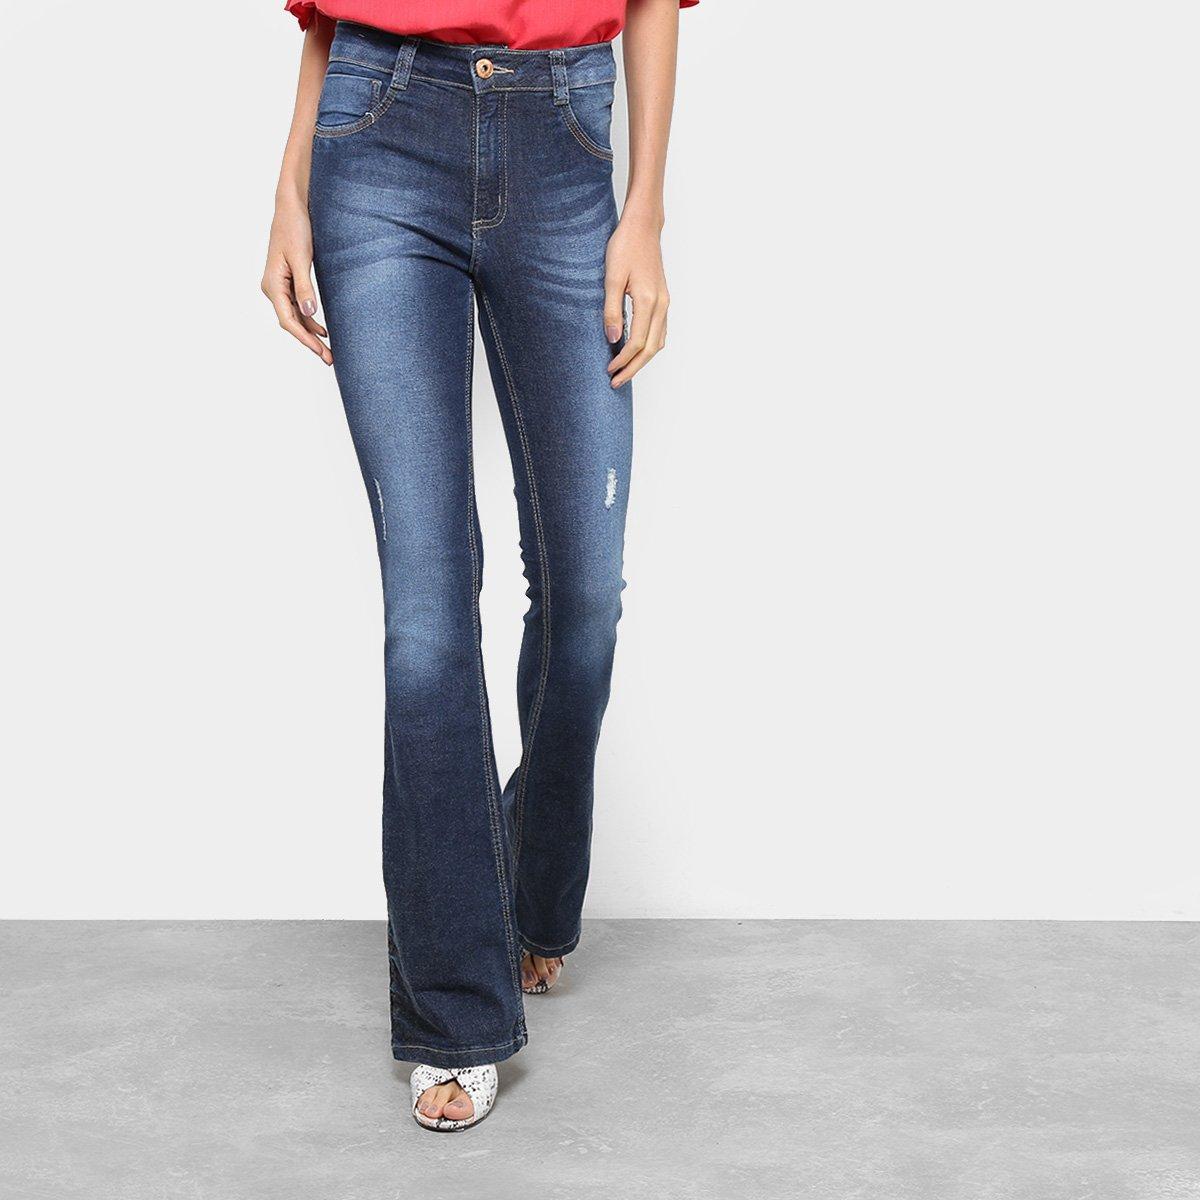 Calça Jeans Flare Biotipo Estonada Puídos Cintura Alta Feminina ... 841cb95ed2